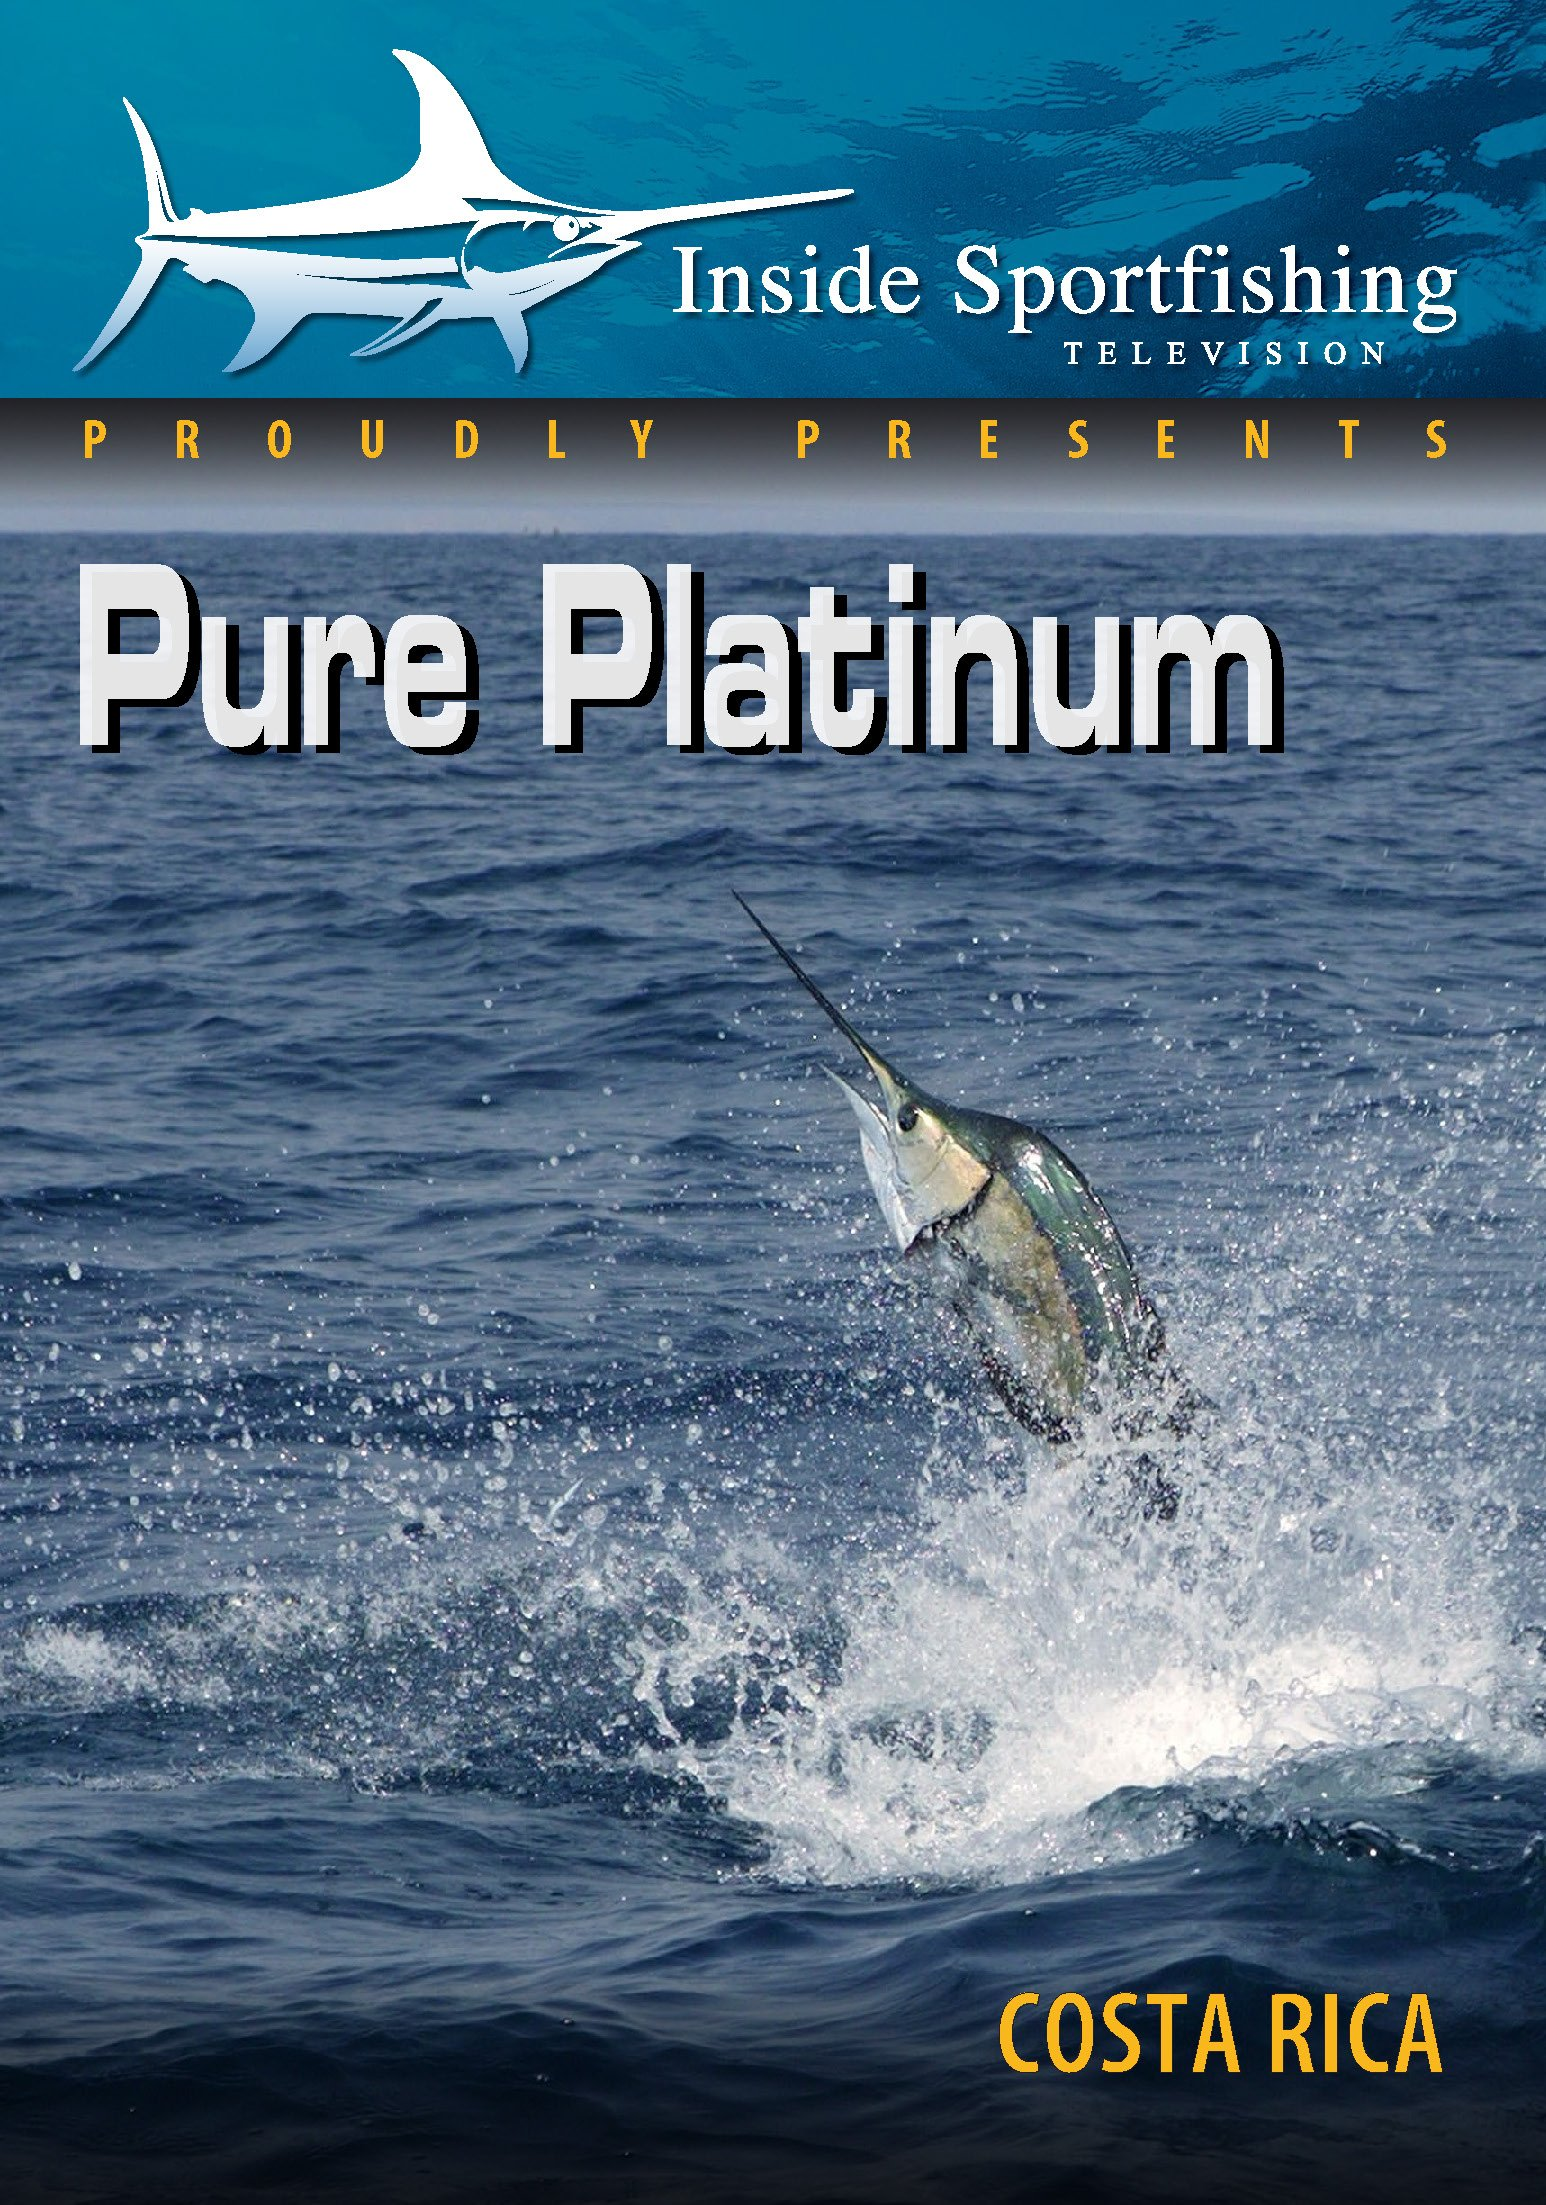 DVD : Inside Sportfishing: Pure Platinum (DVD)